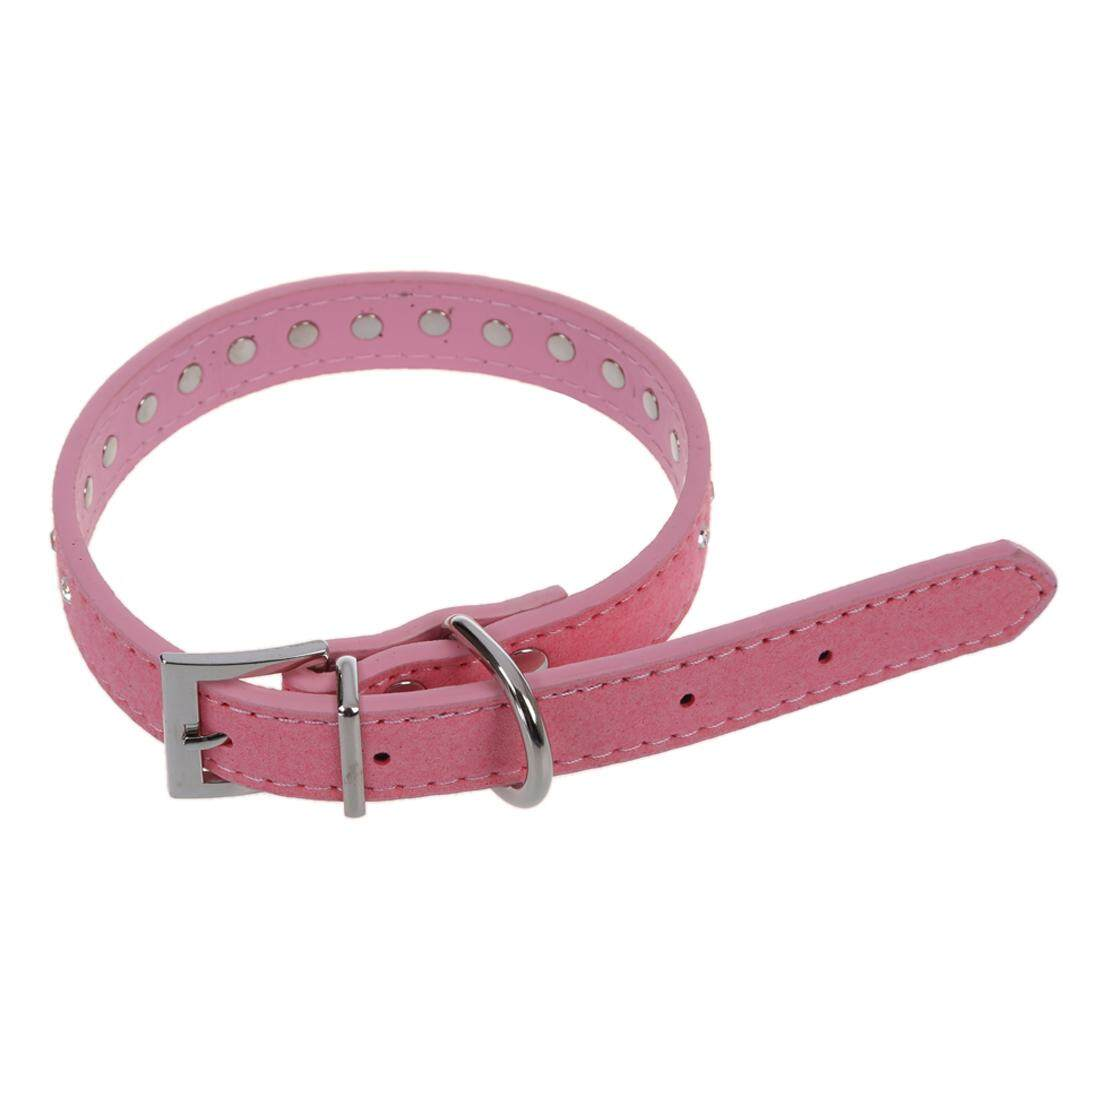 Pink PU Dog Pet Pitbull Rhinestone Stud Rivets Neck Collar Strap M